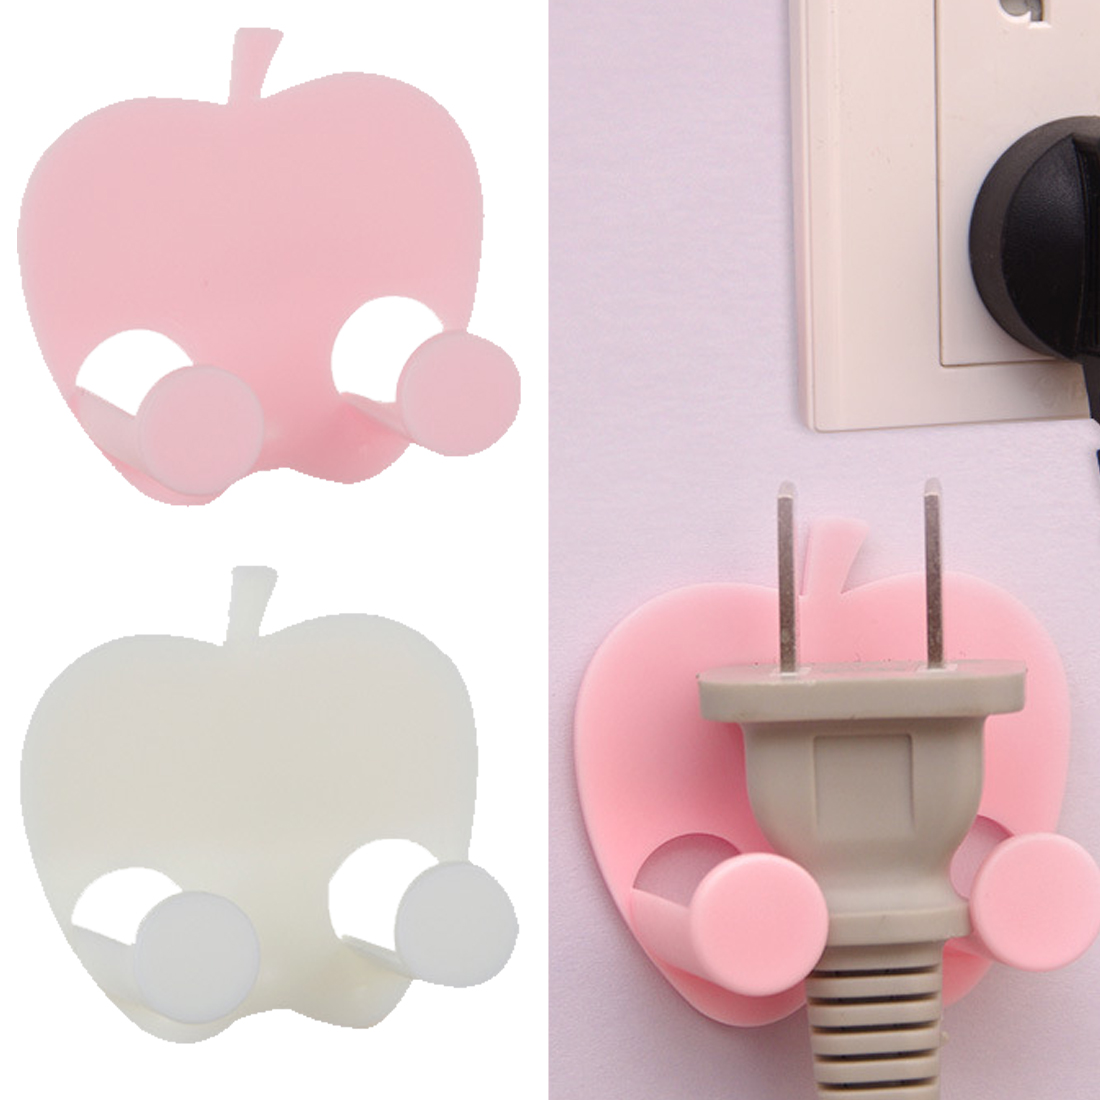 Power Plug Socket Apple Shape Hook Rack Holder Hanger Home Wall Decor Organizer Multifunctional Adhesive Hook